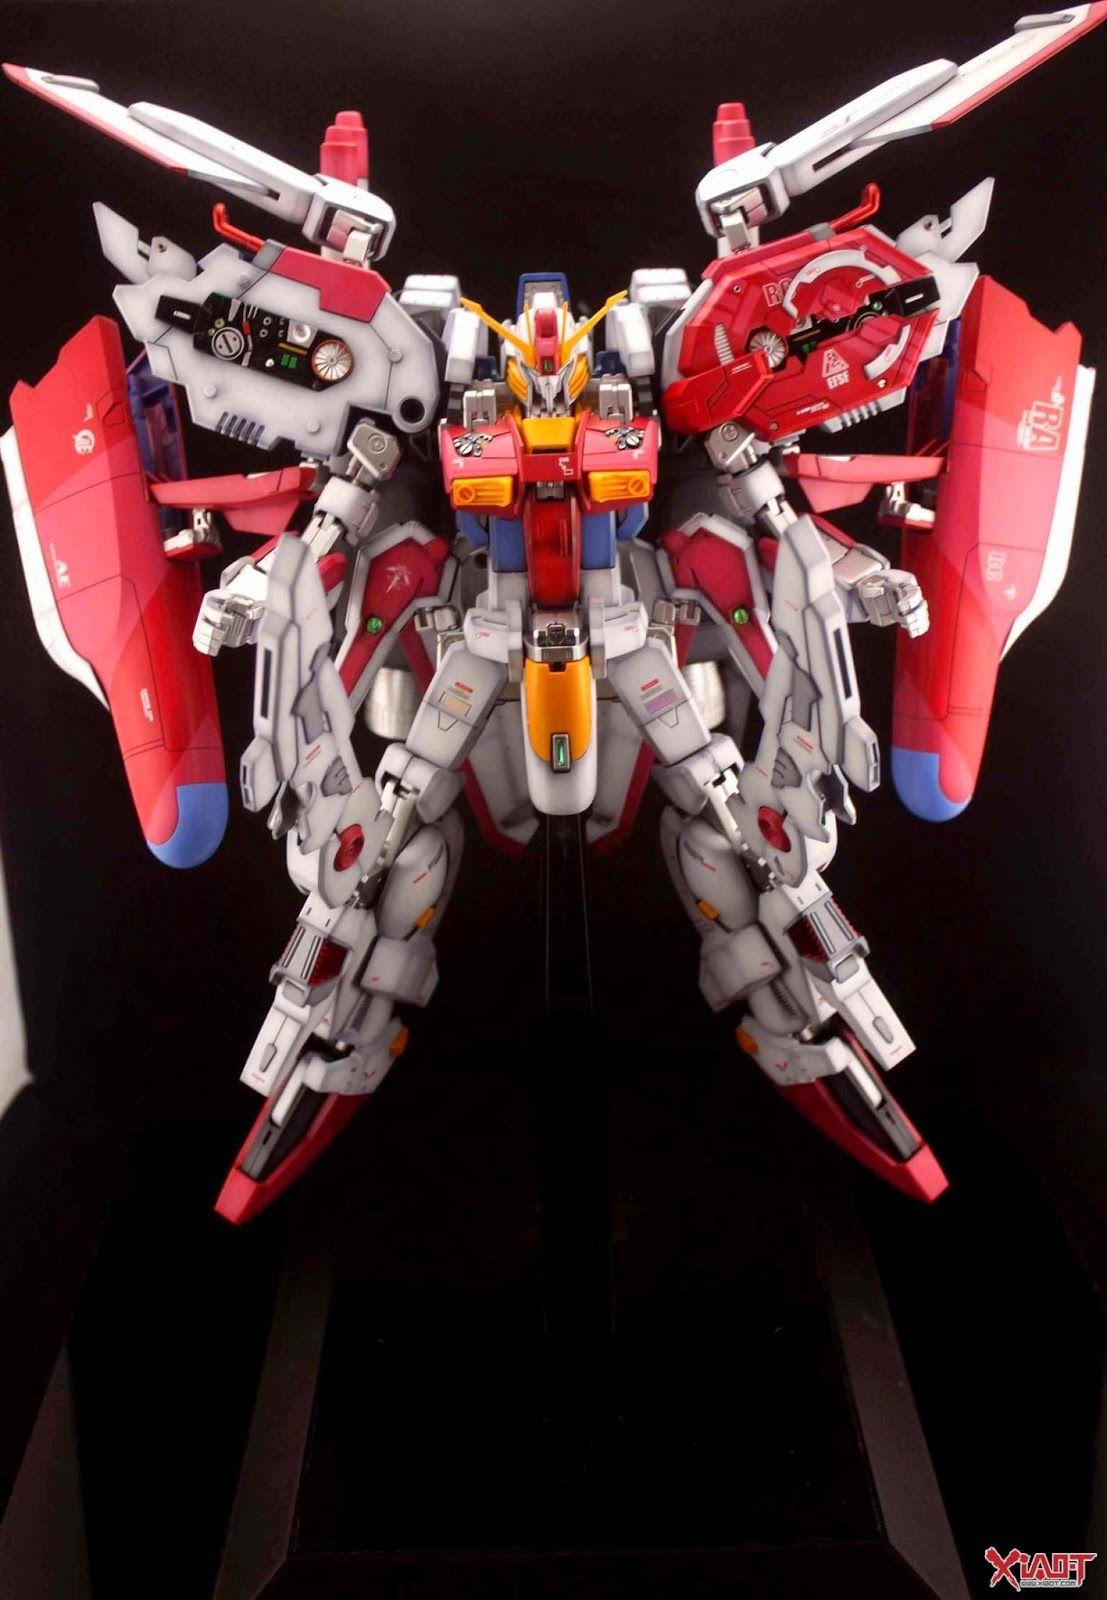 MG 1/100 ExS Gundam Flaming Red Colors Custom Build